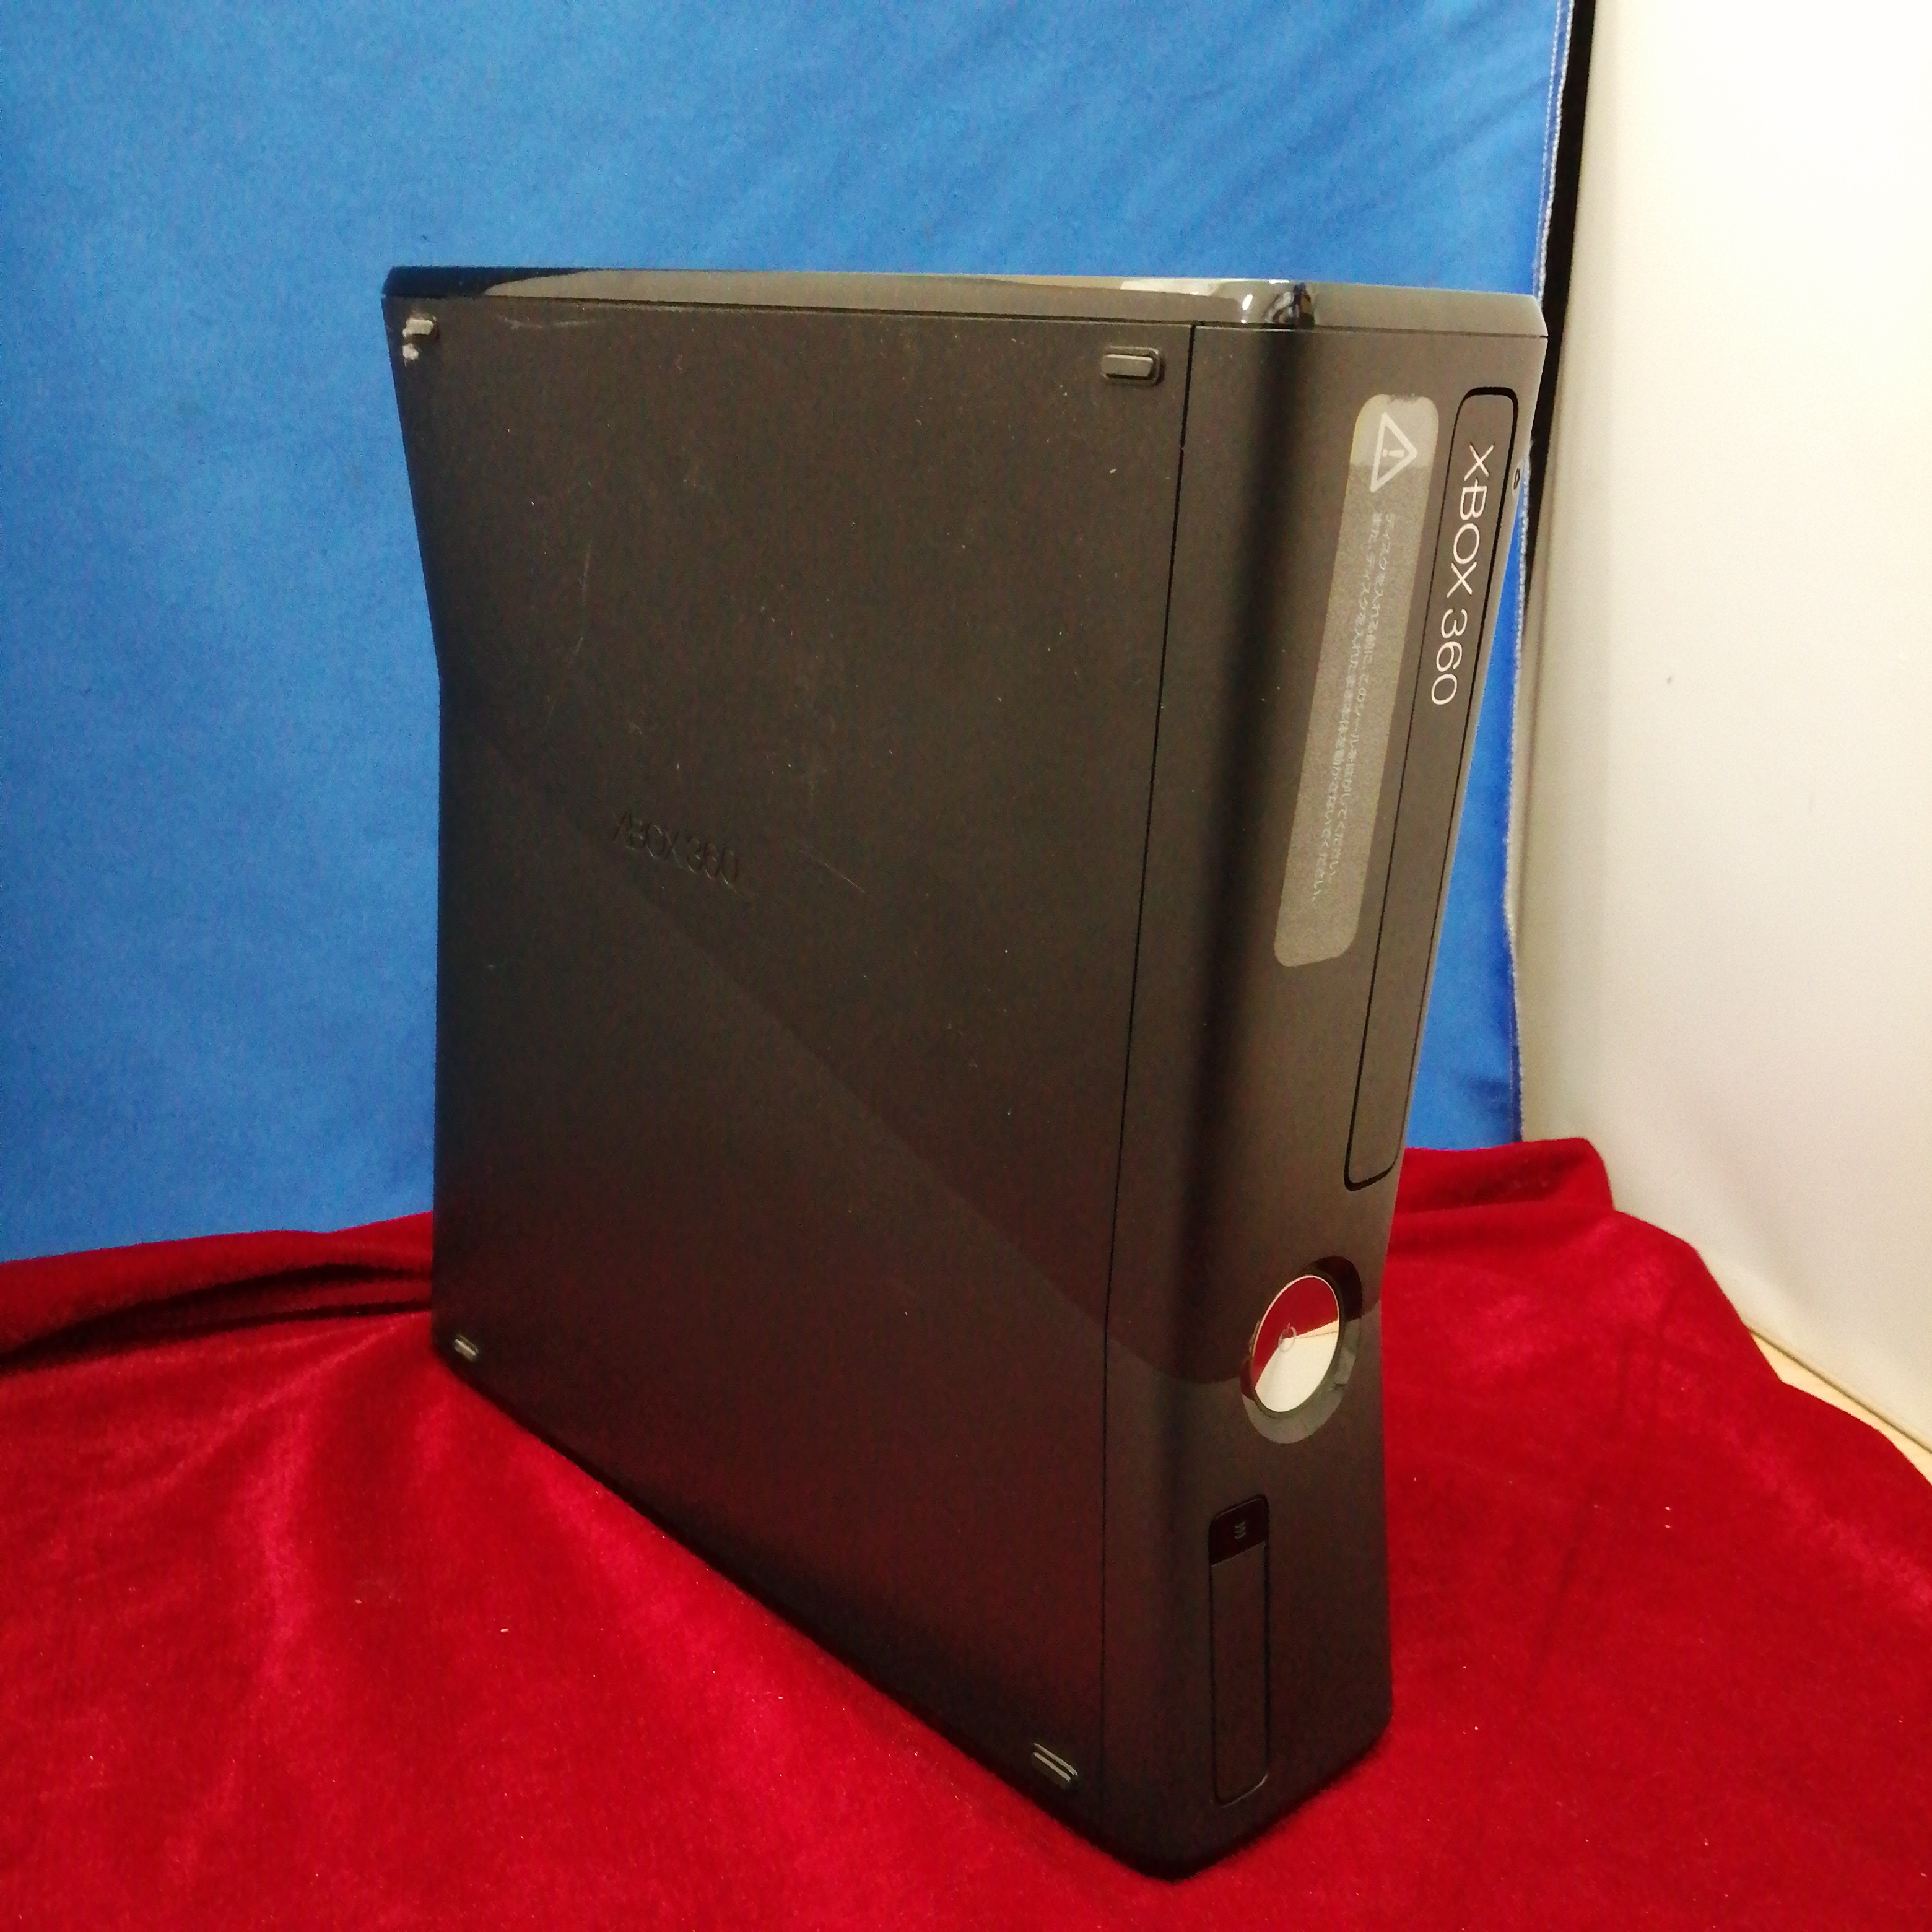 RKH-00054/1439/XBOX360 S/後期型 MICROSOFT